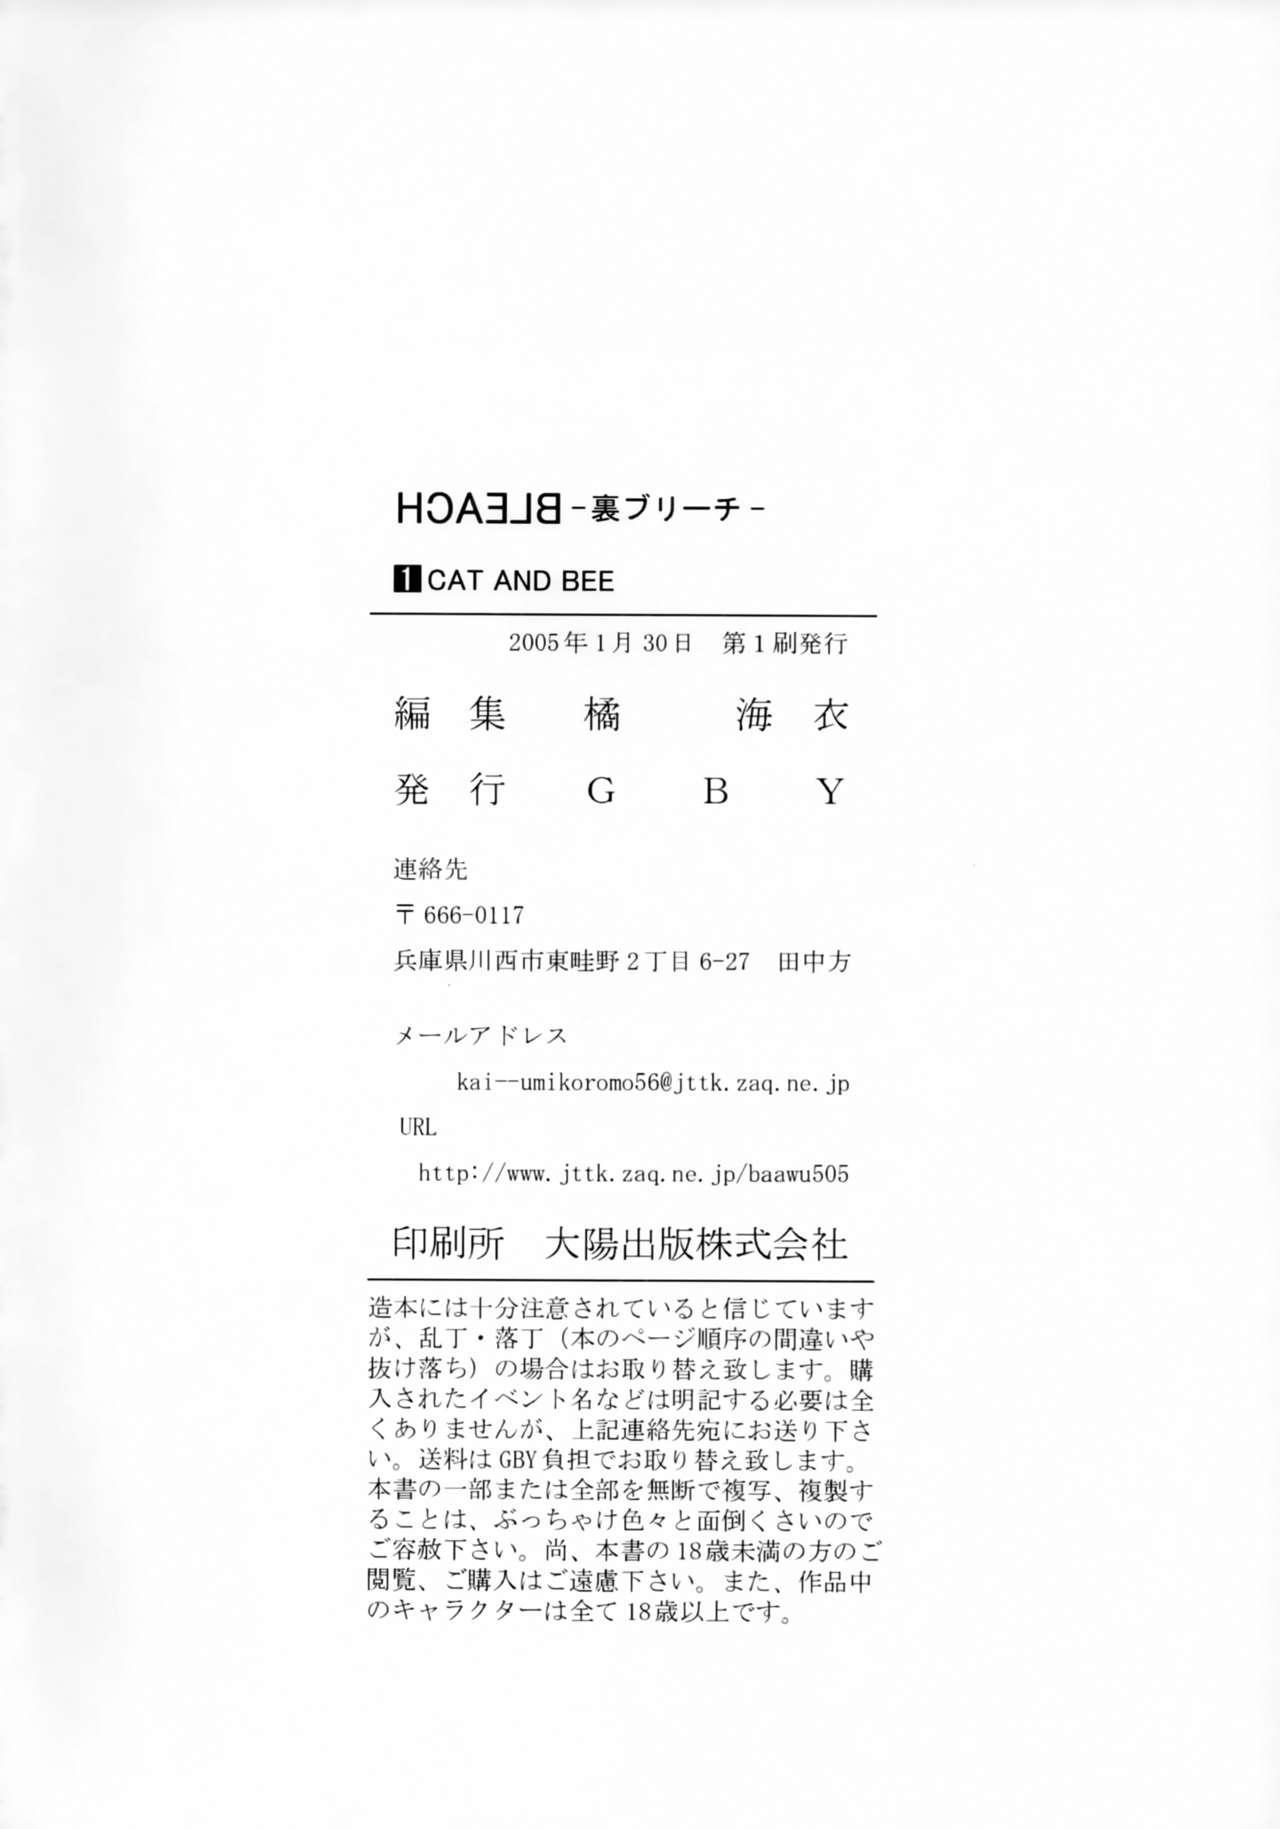 HCAELB 24